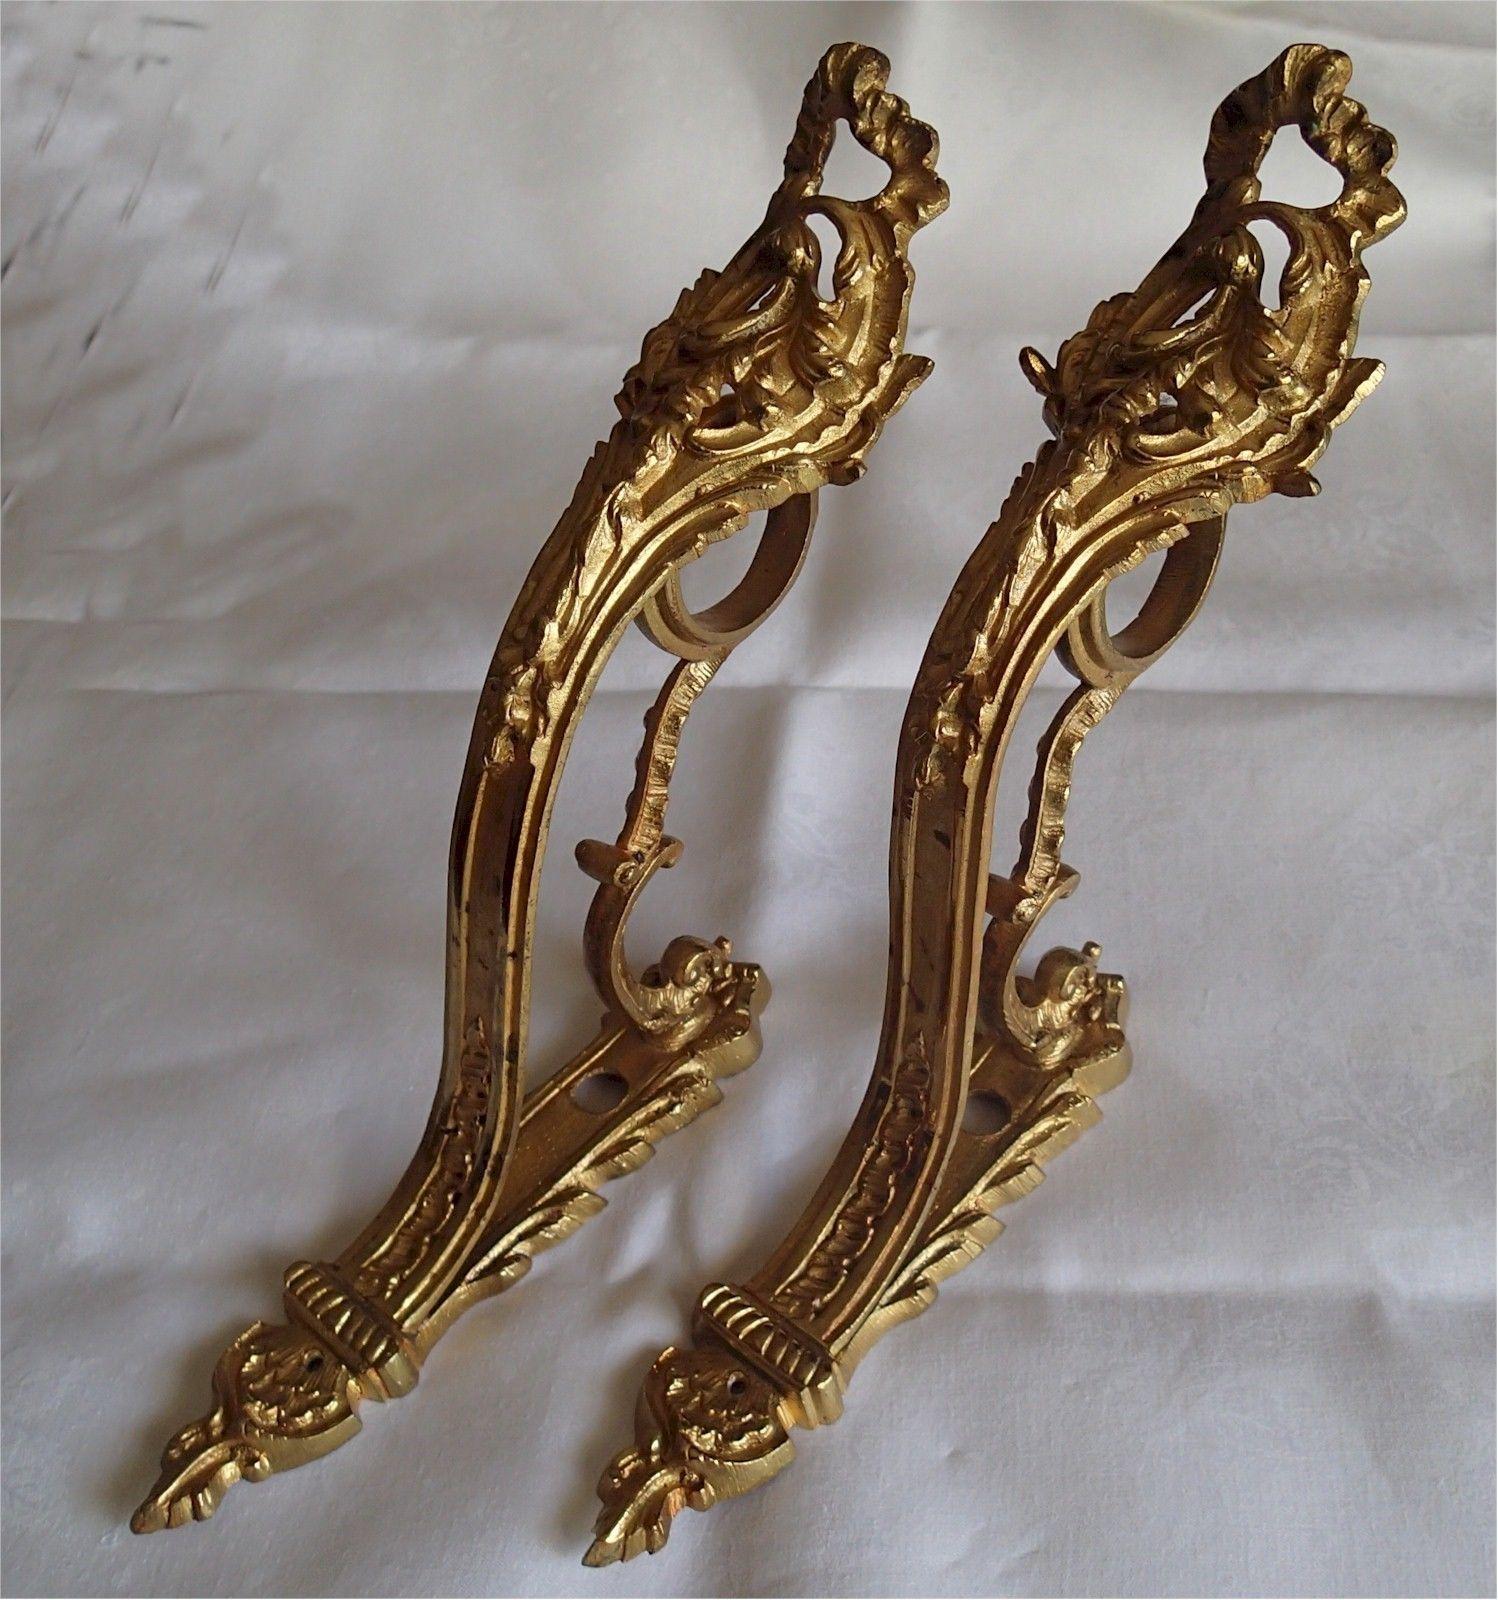 Vintage Ornate Gold Gilt Metal Curtain Brackets